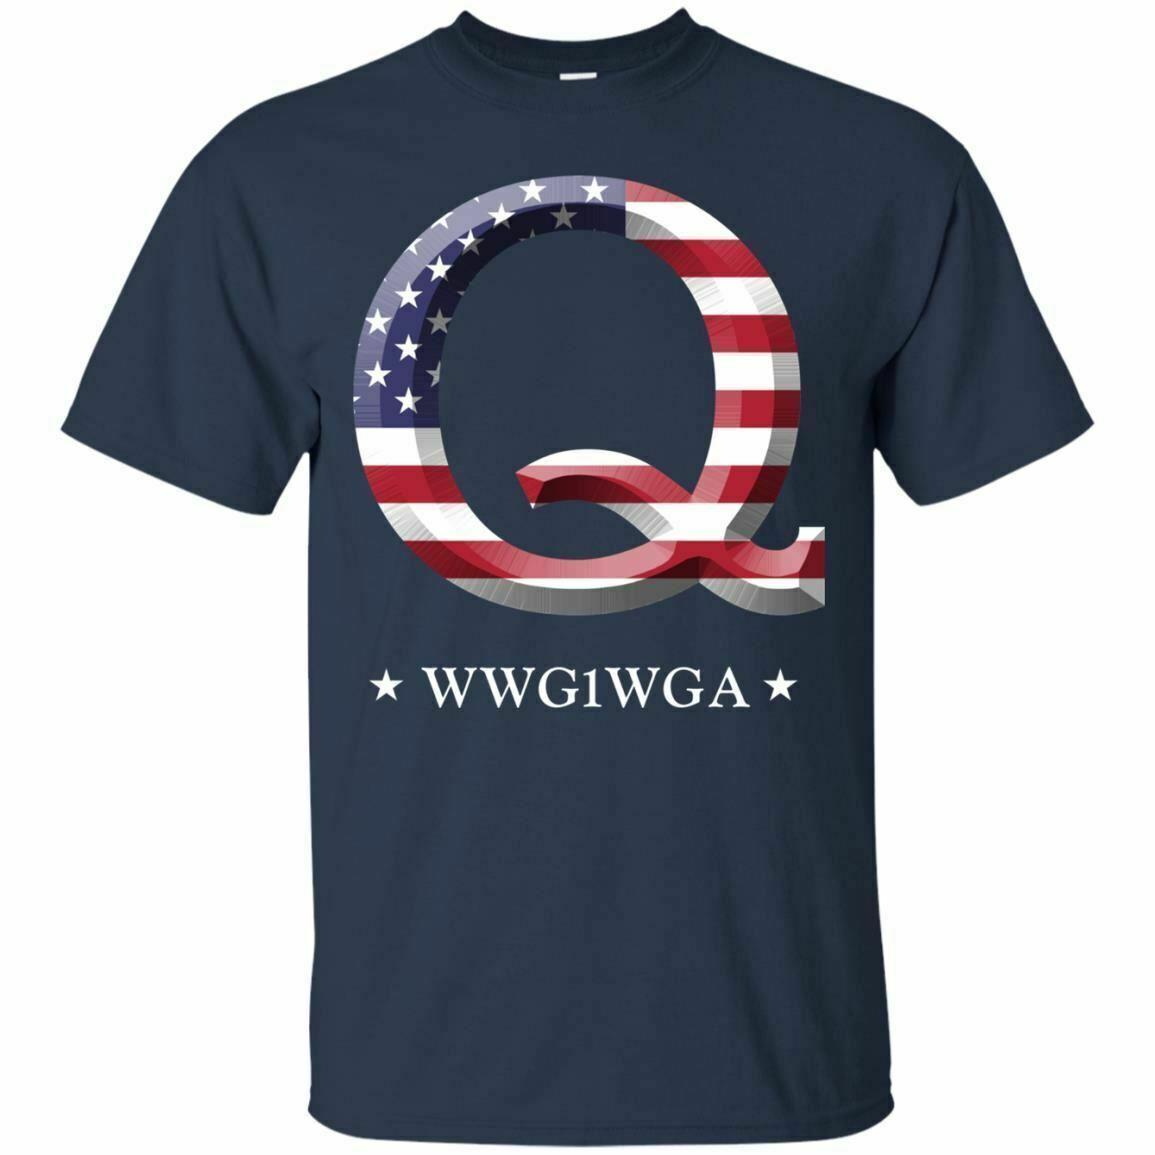 QAnon WWG1WGA Q Anon Camisa dos homens Grande Despertar MAGA EUA Tee Marinha